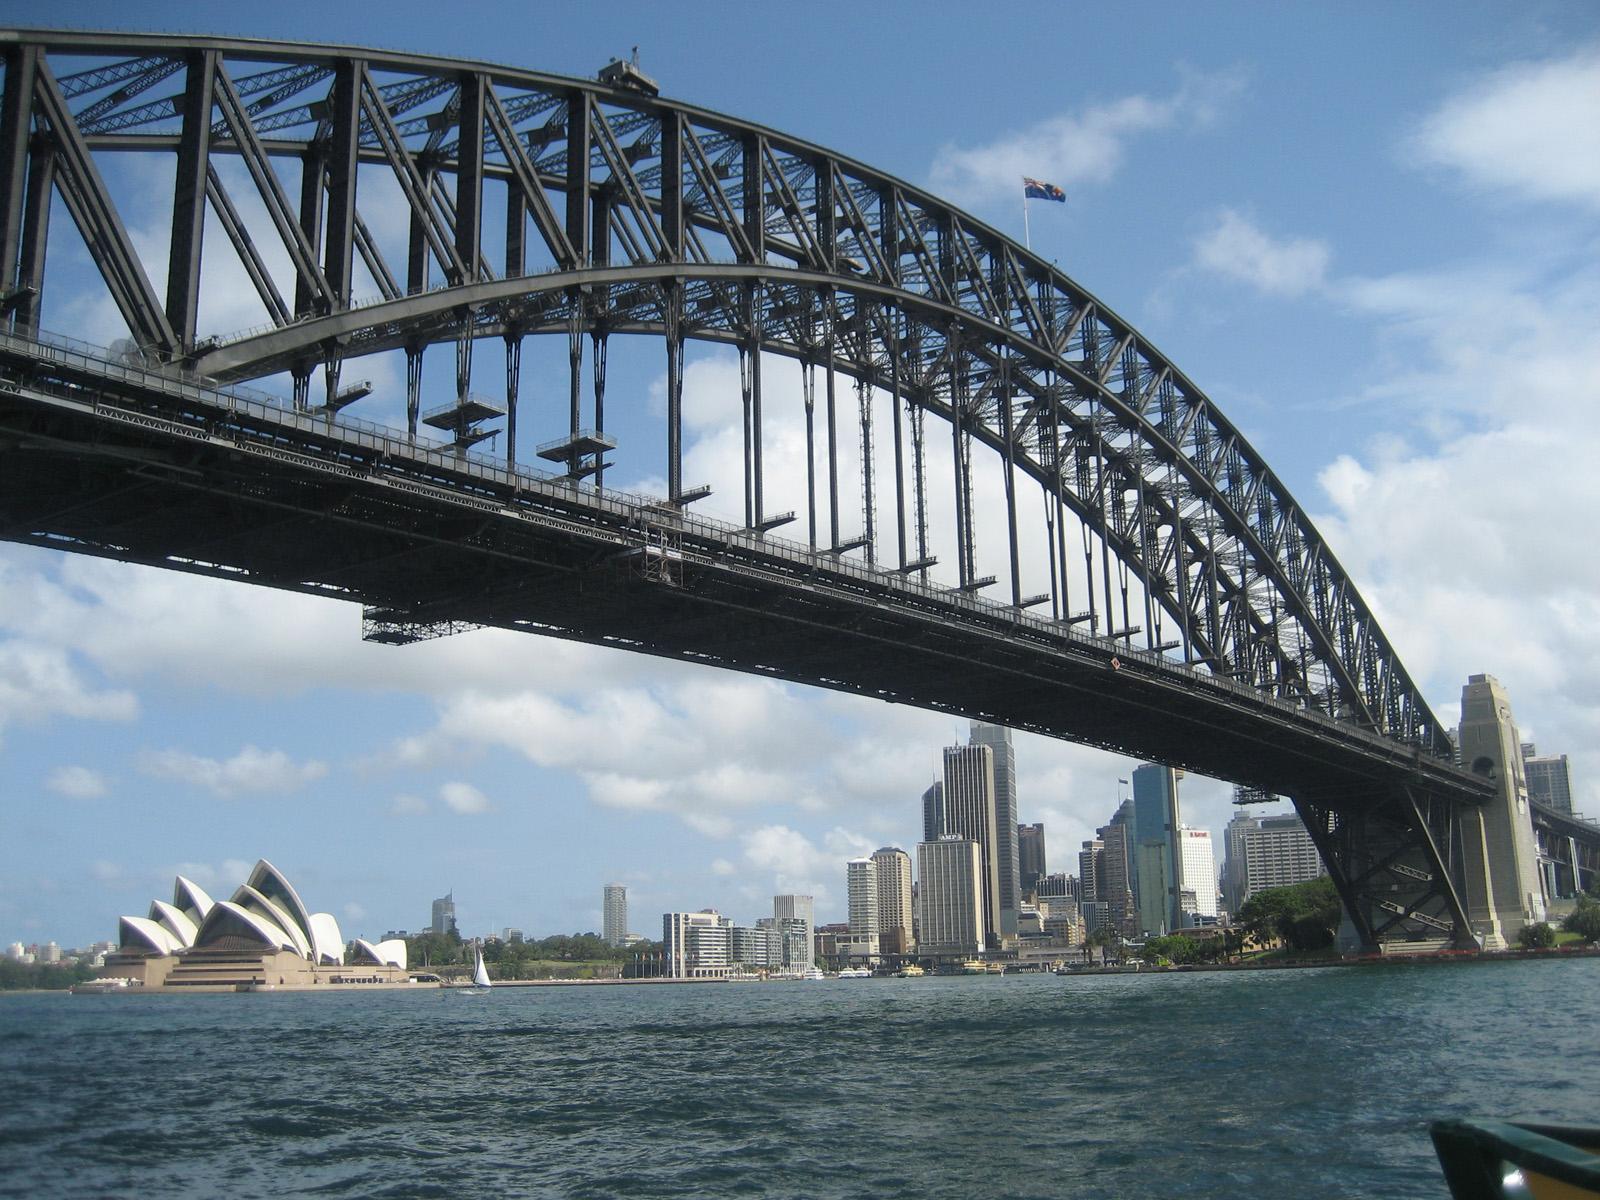 Let S Enjoy The Beauty The World S Most Beautiful Bridges